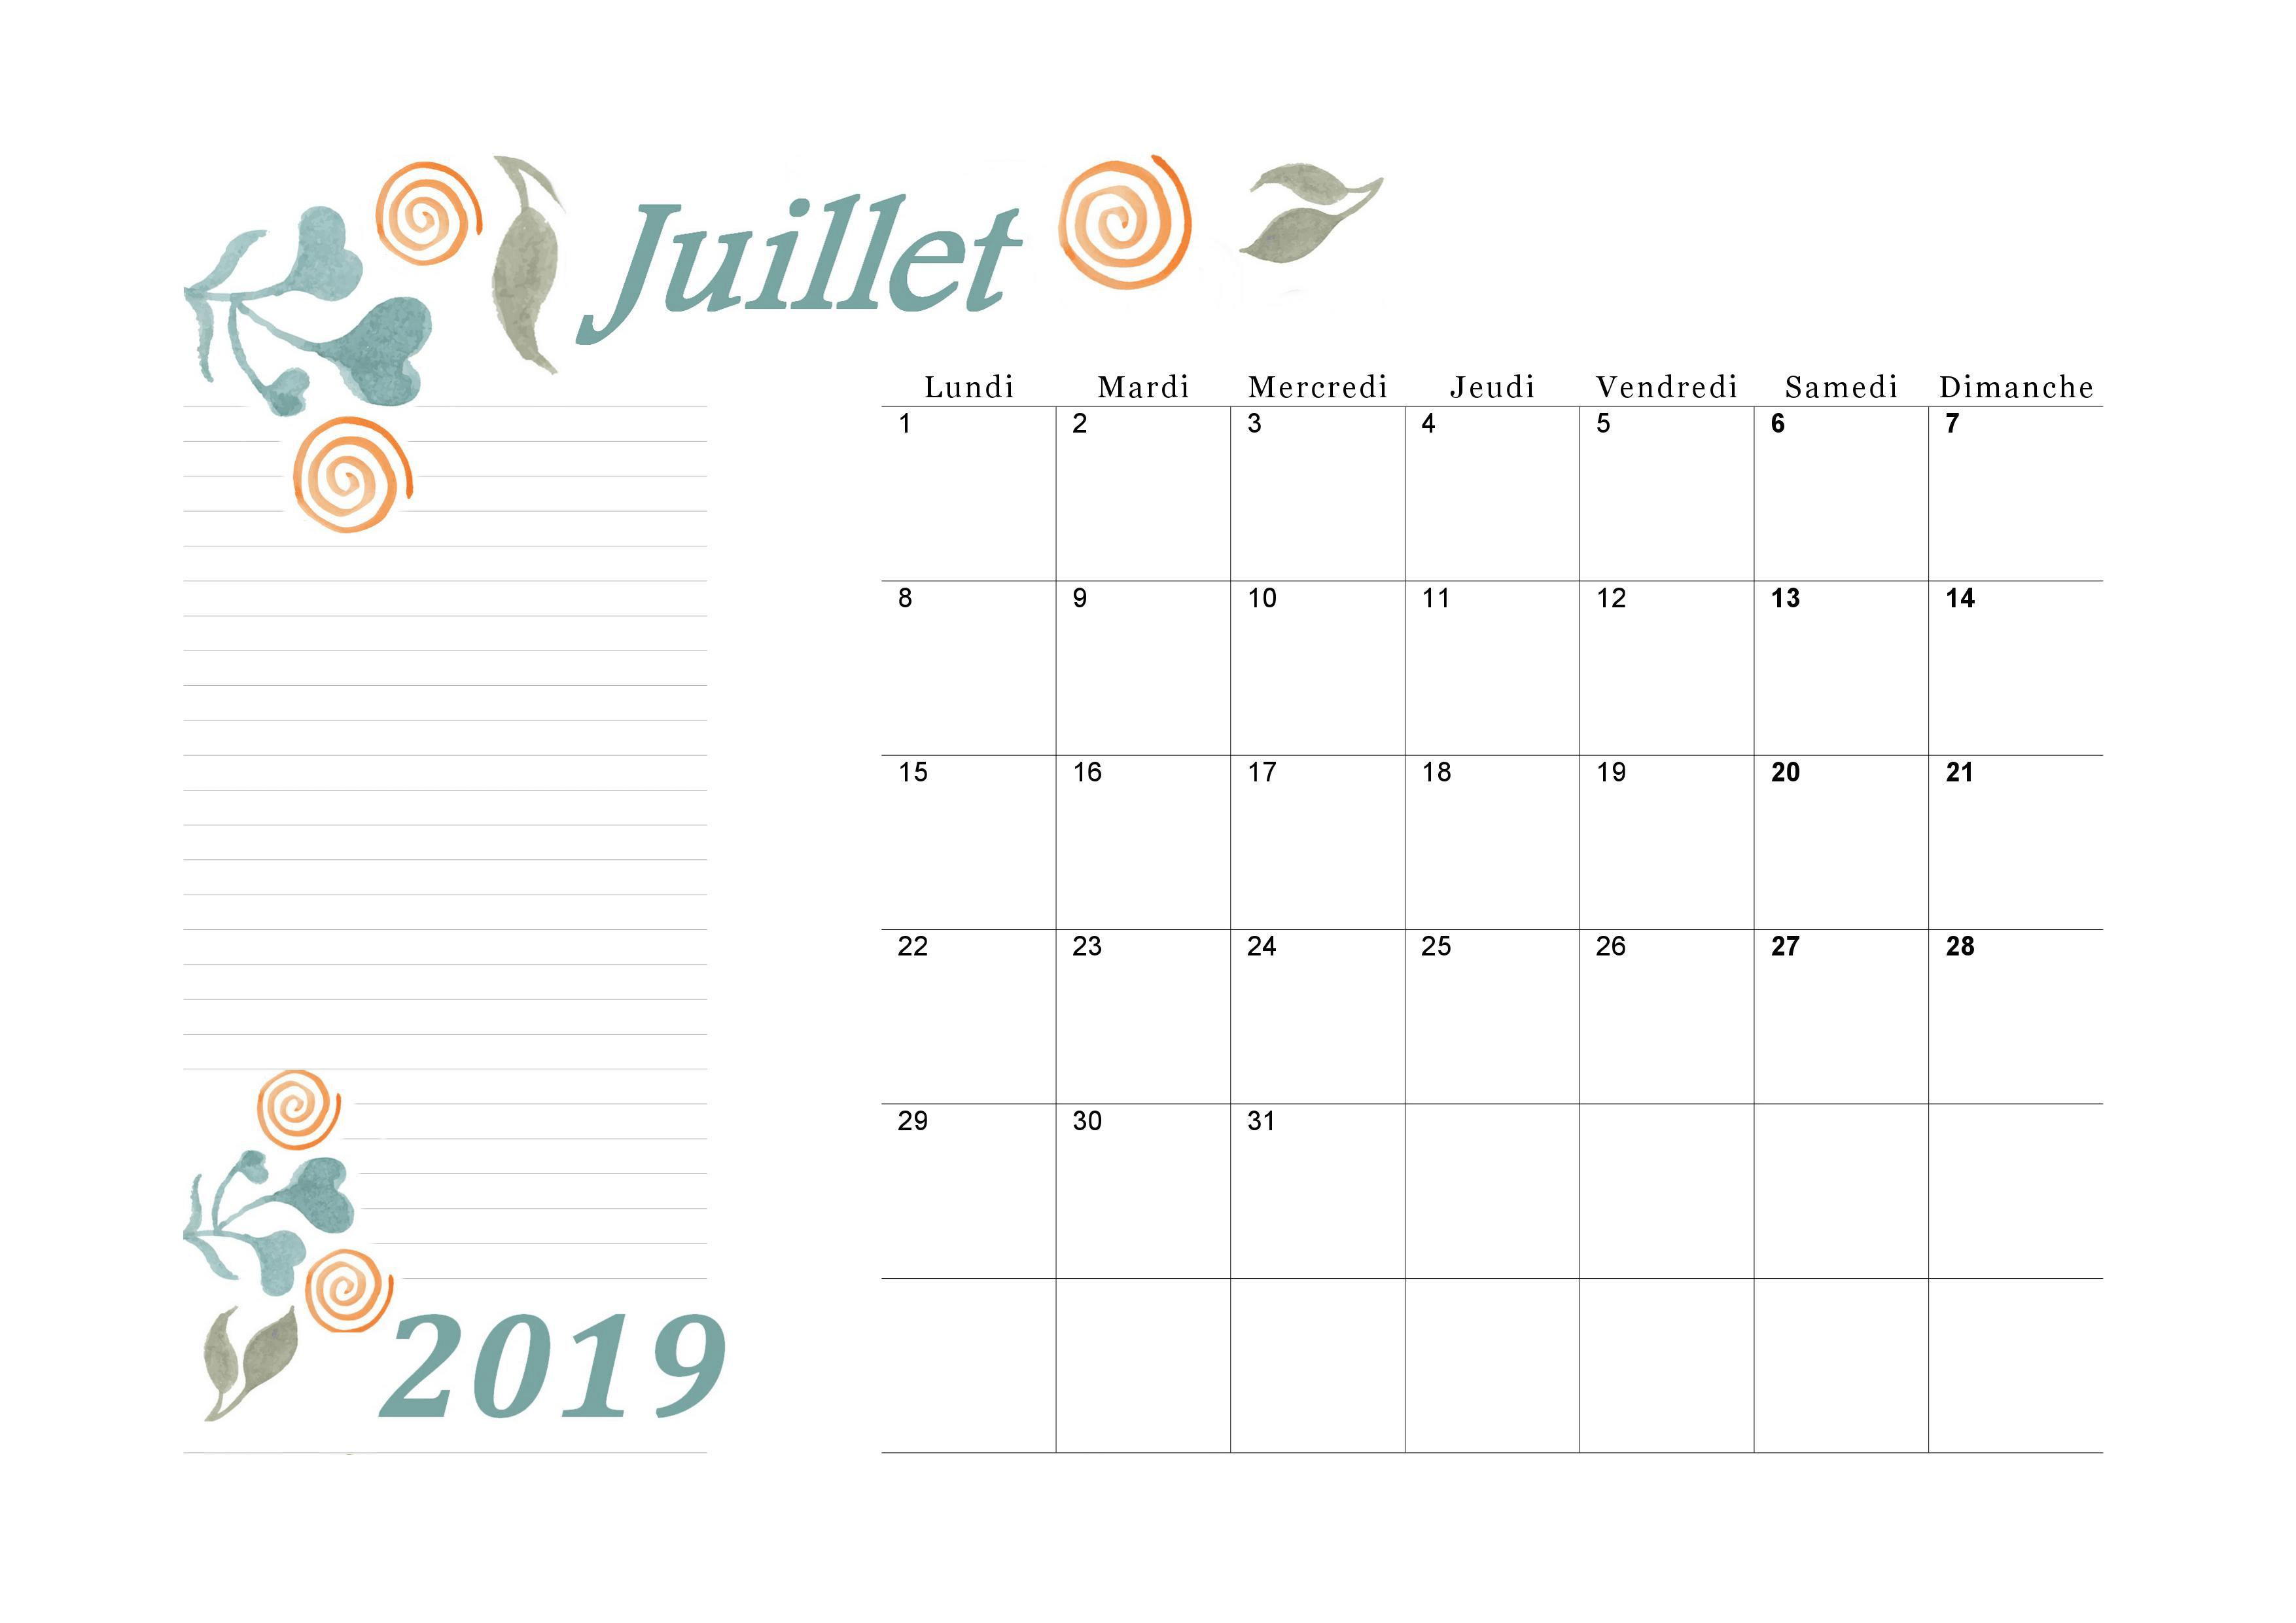 Calendrier A Imprimer Juillet 2019.Calendrier Mensuel 2019 Du Mois De Juillet A Imprimer